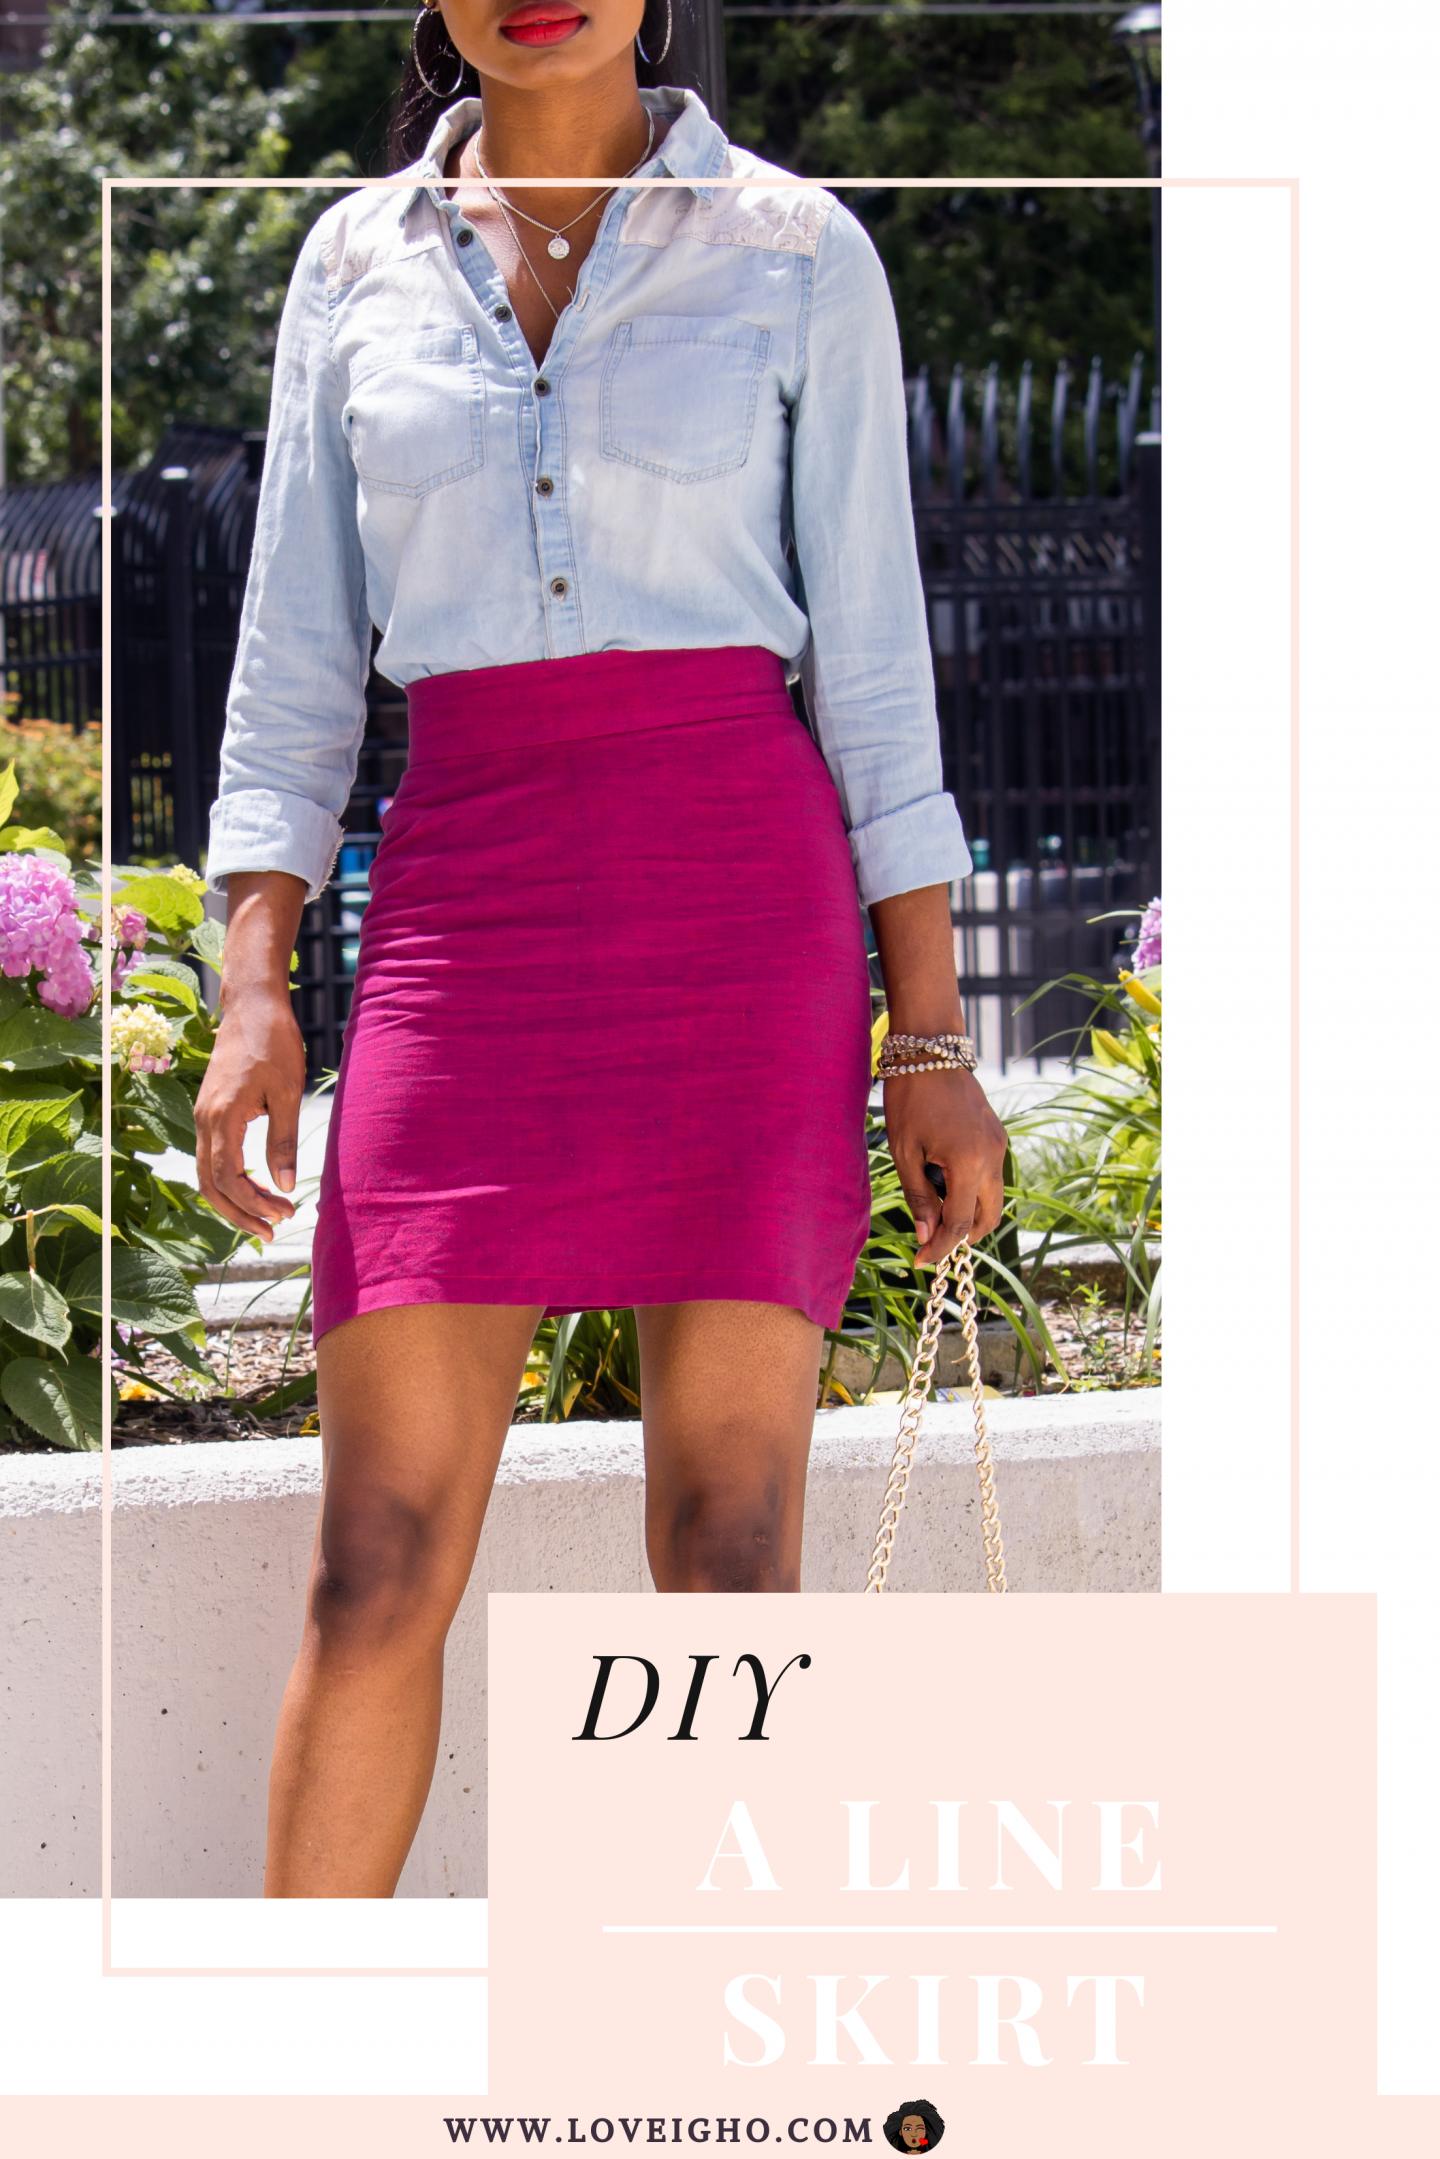 DIY A-Line SKIRT | Pin | Love Igho